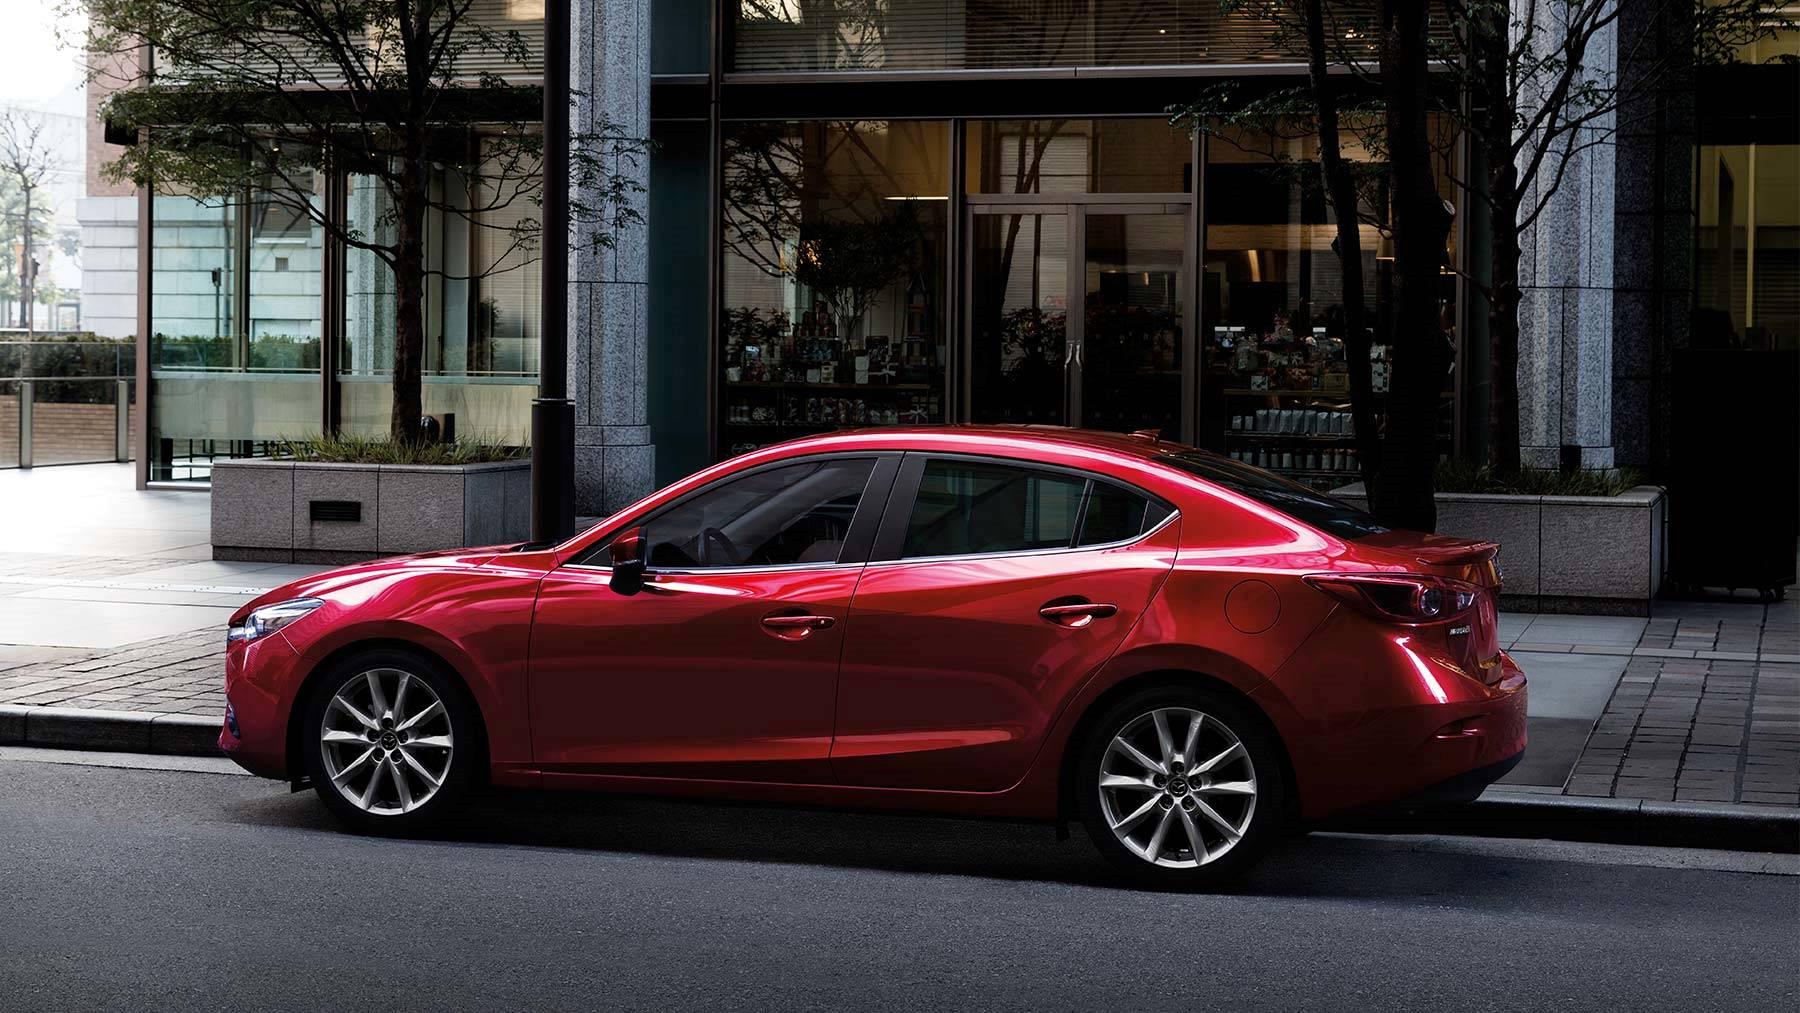 2018 Mazda3 for Sale in Sacramento, CA - Maita Automotive Group